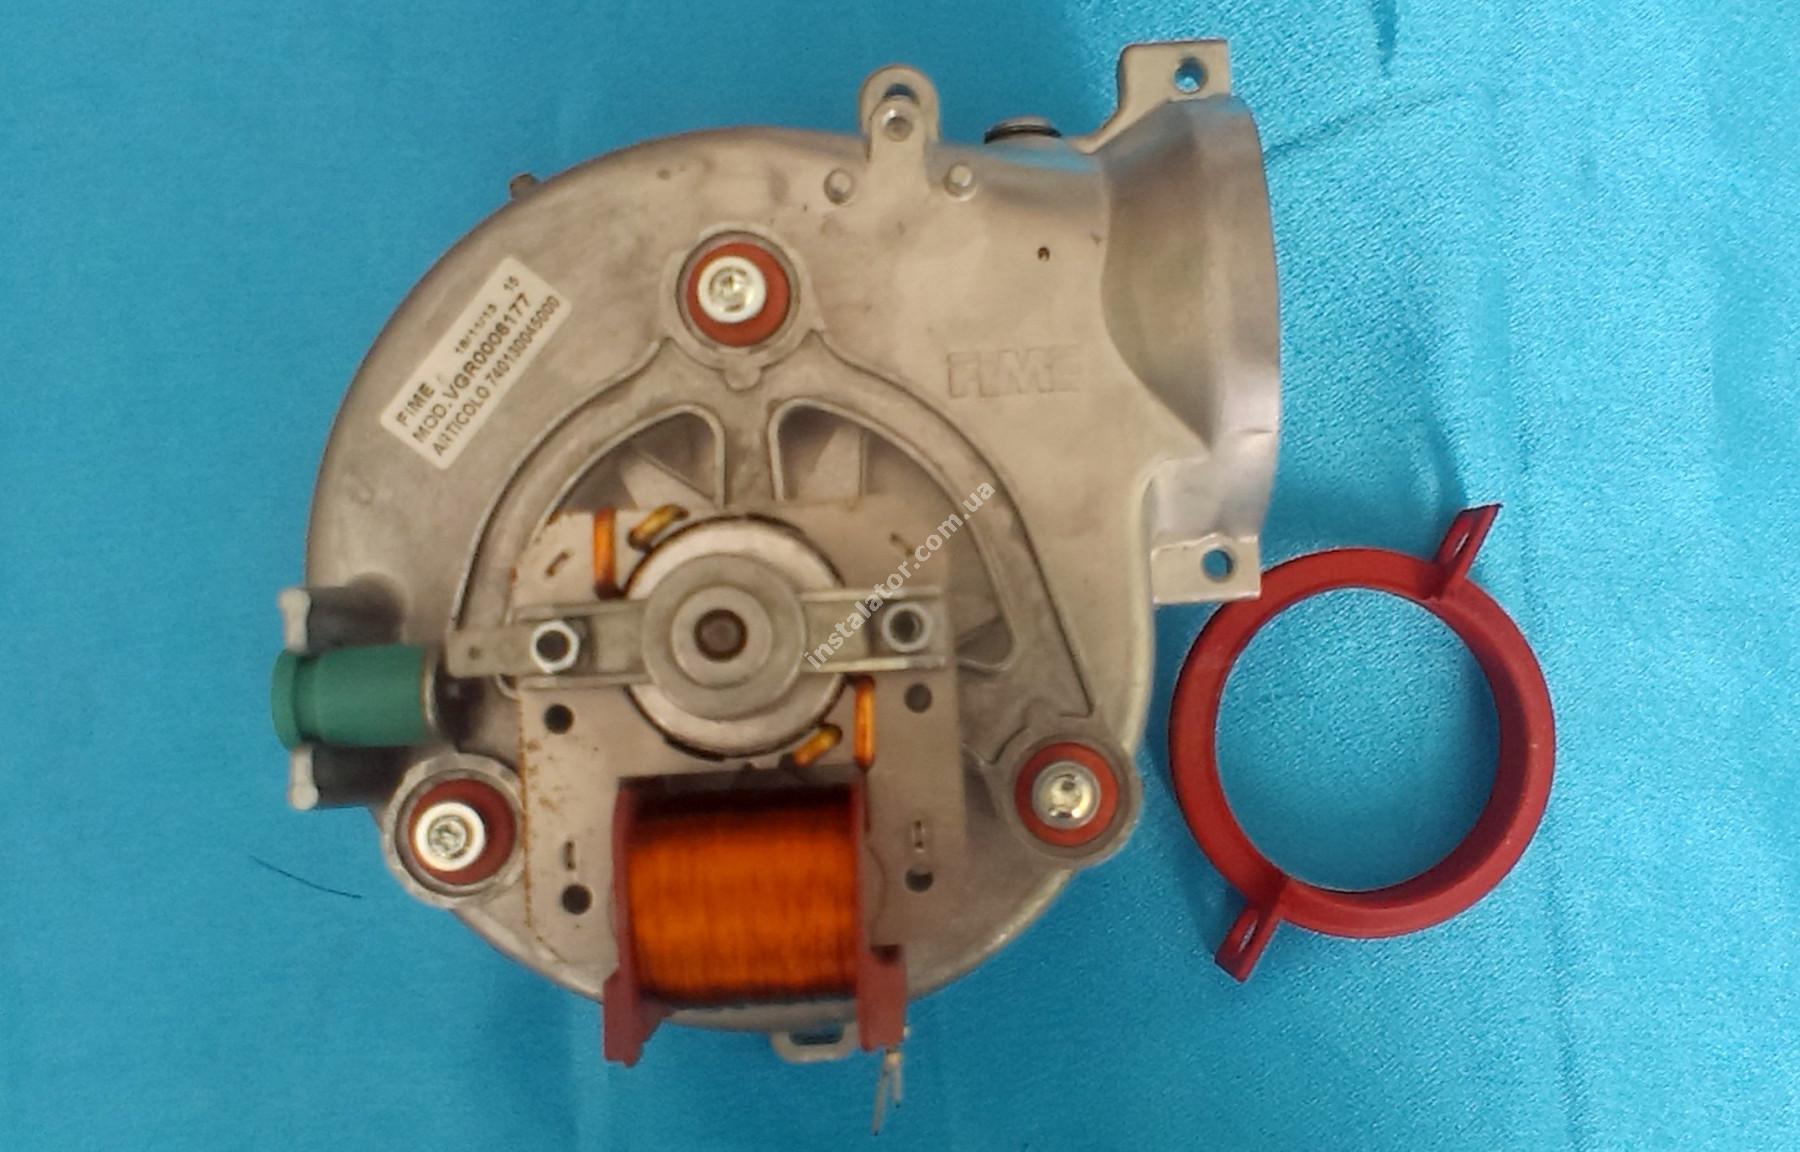 65104357  Турбіна (вентилятор) ARISTON EGIS, AS, BS, CLAS, CLAS SYSTEM full-image-4